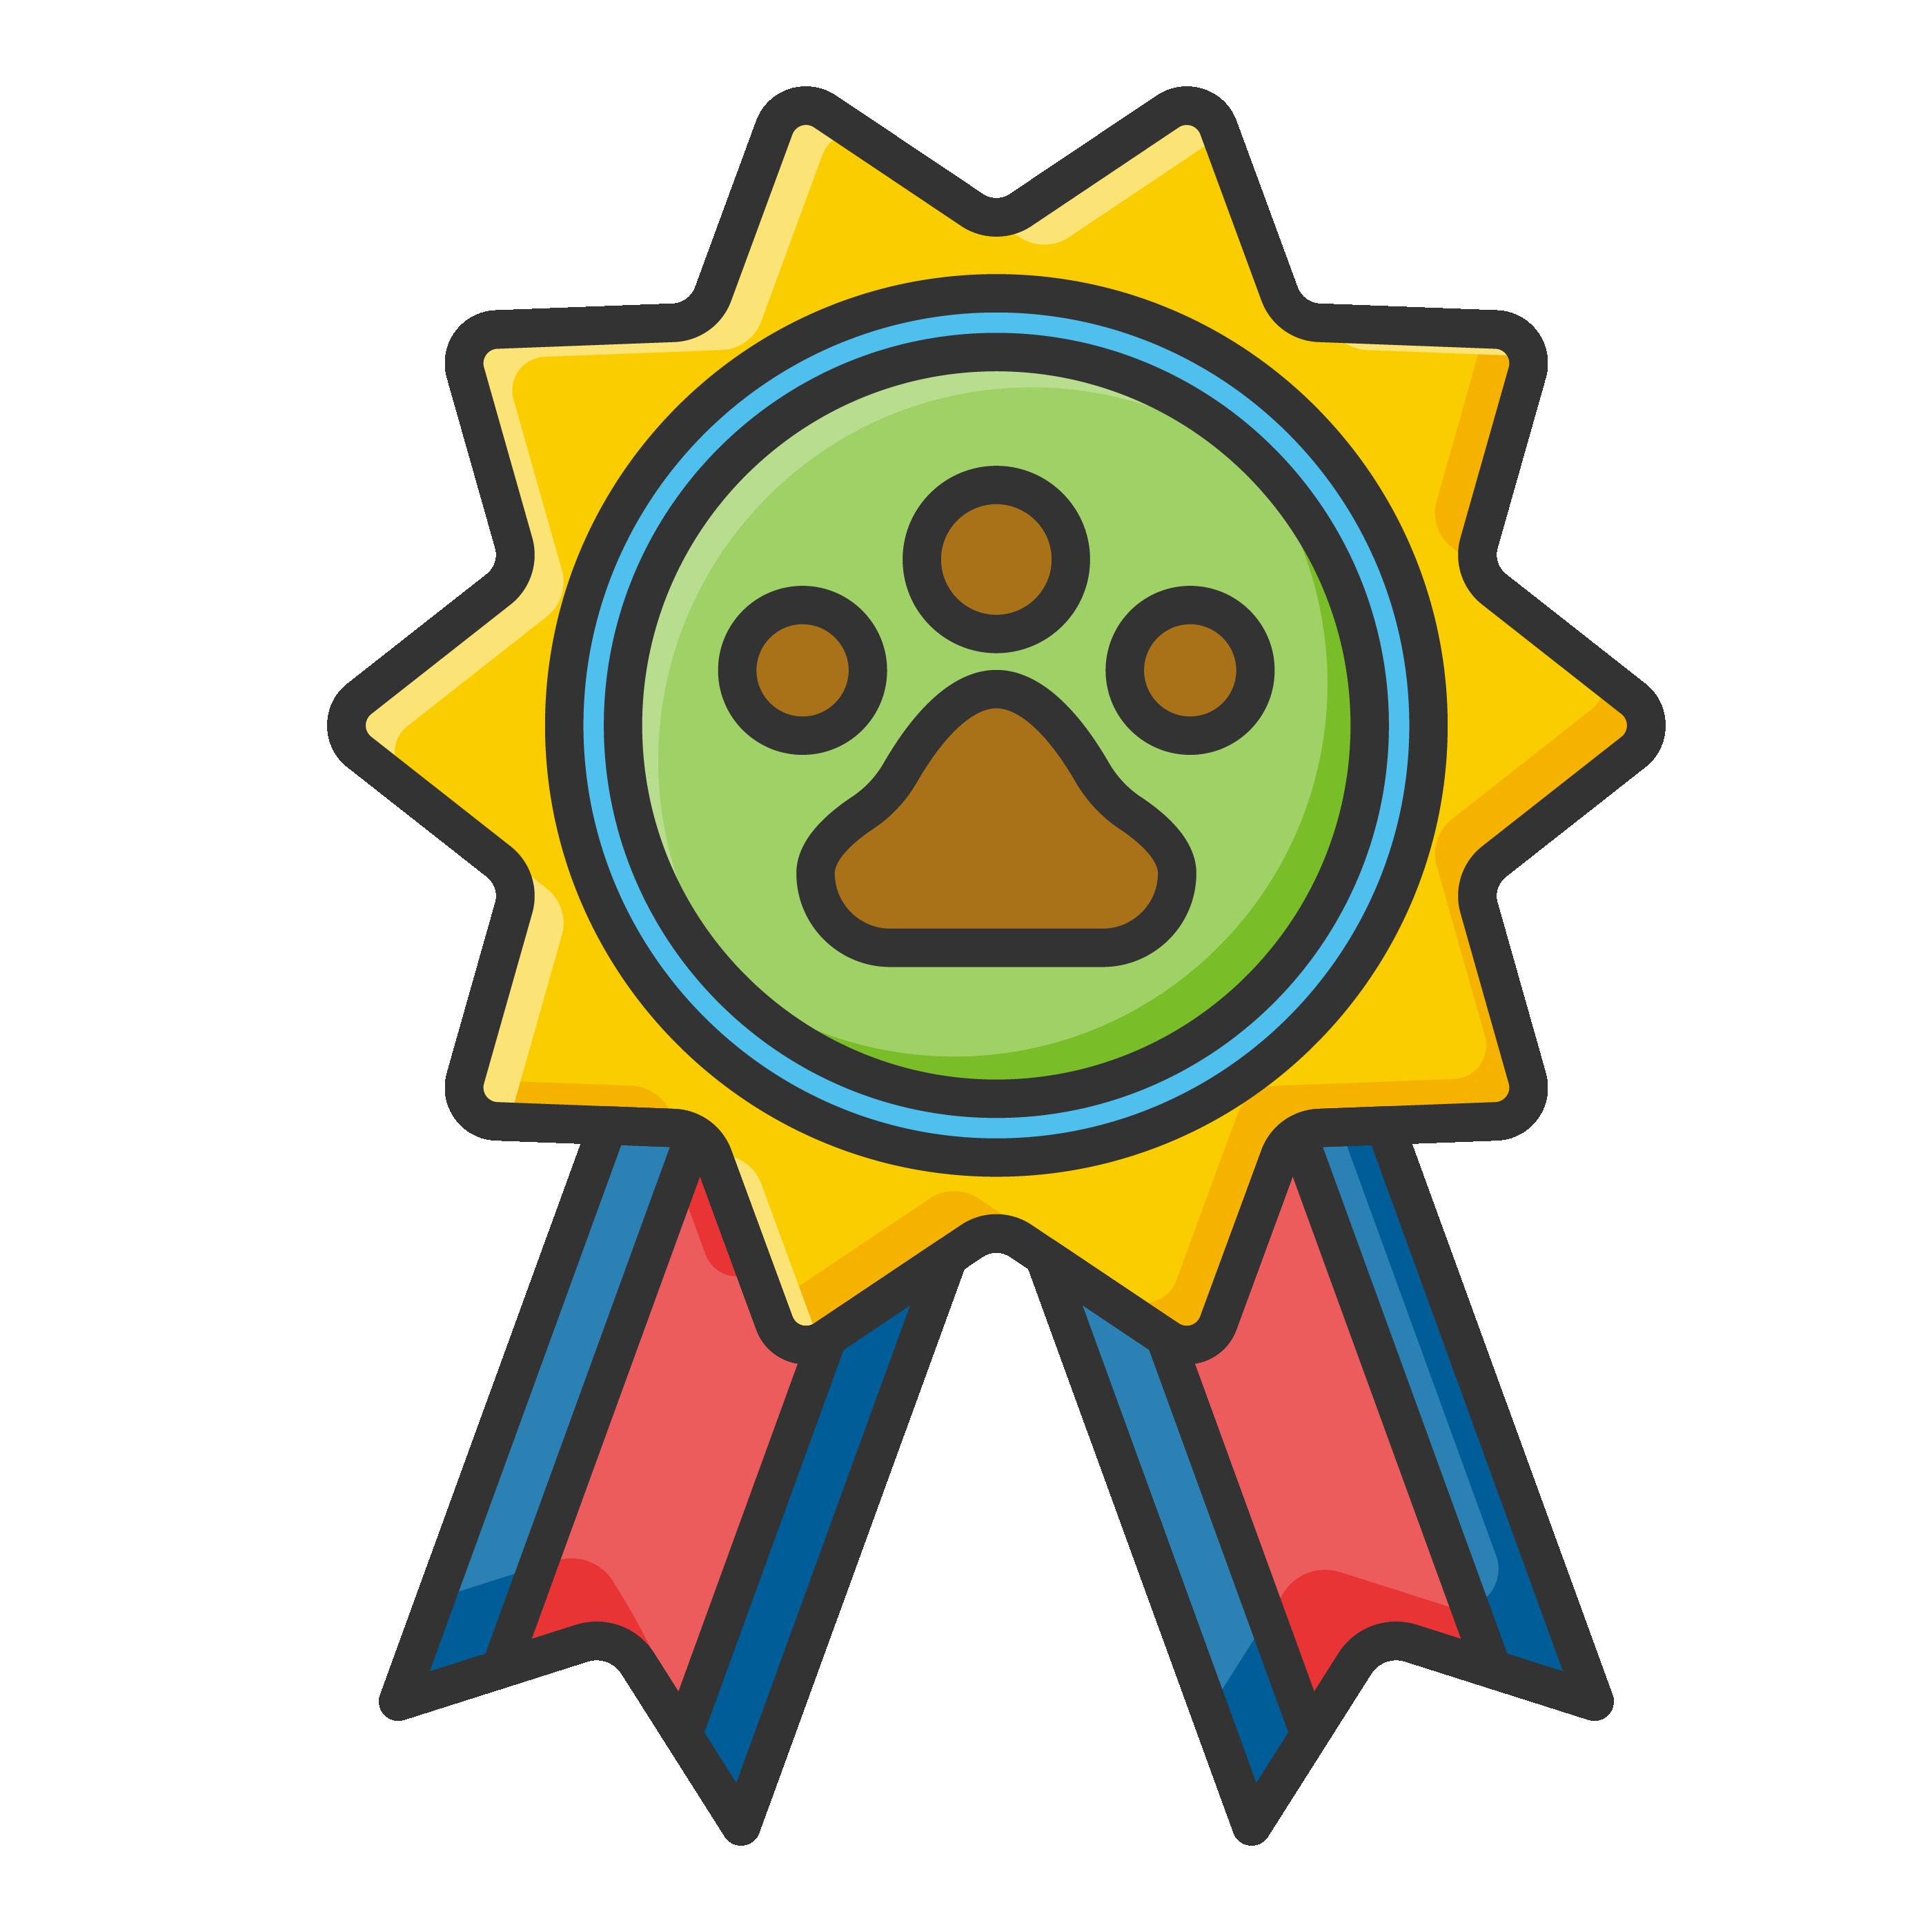 designer-tag-icon